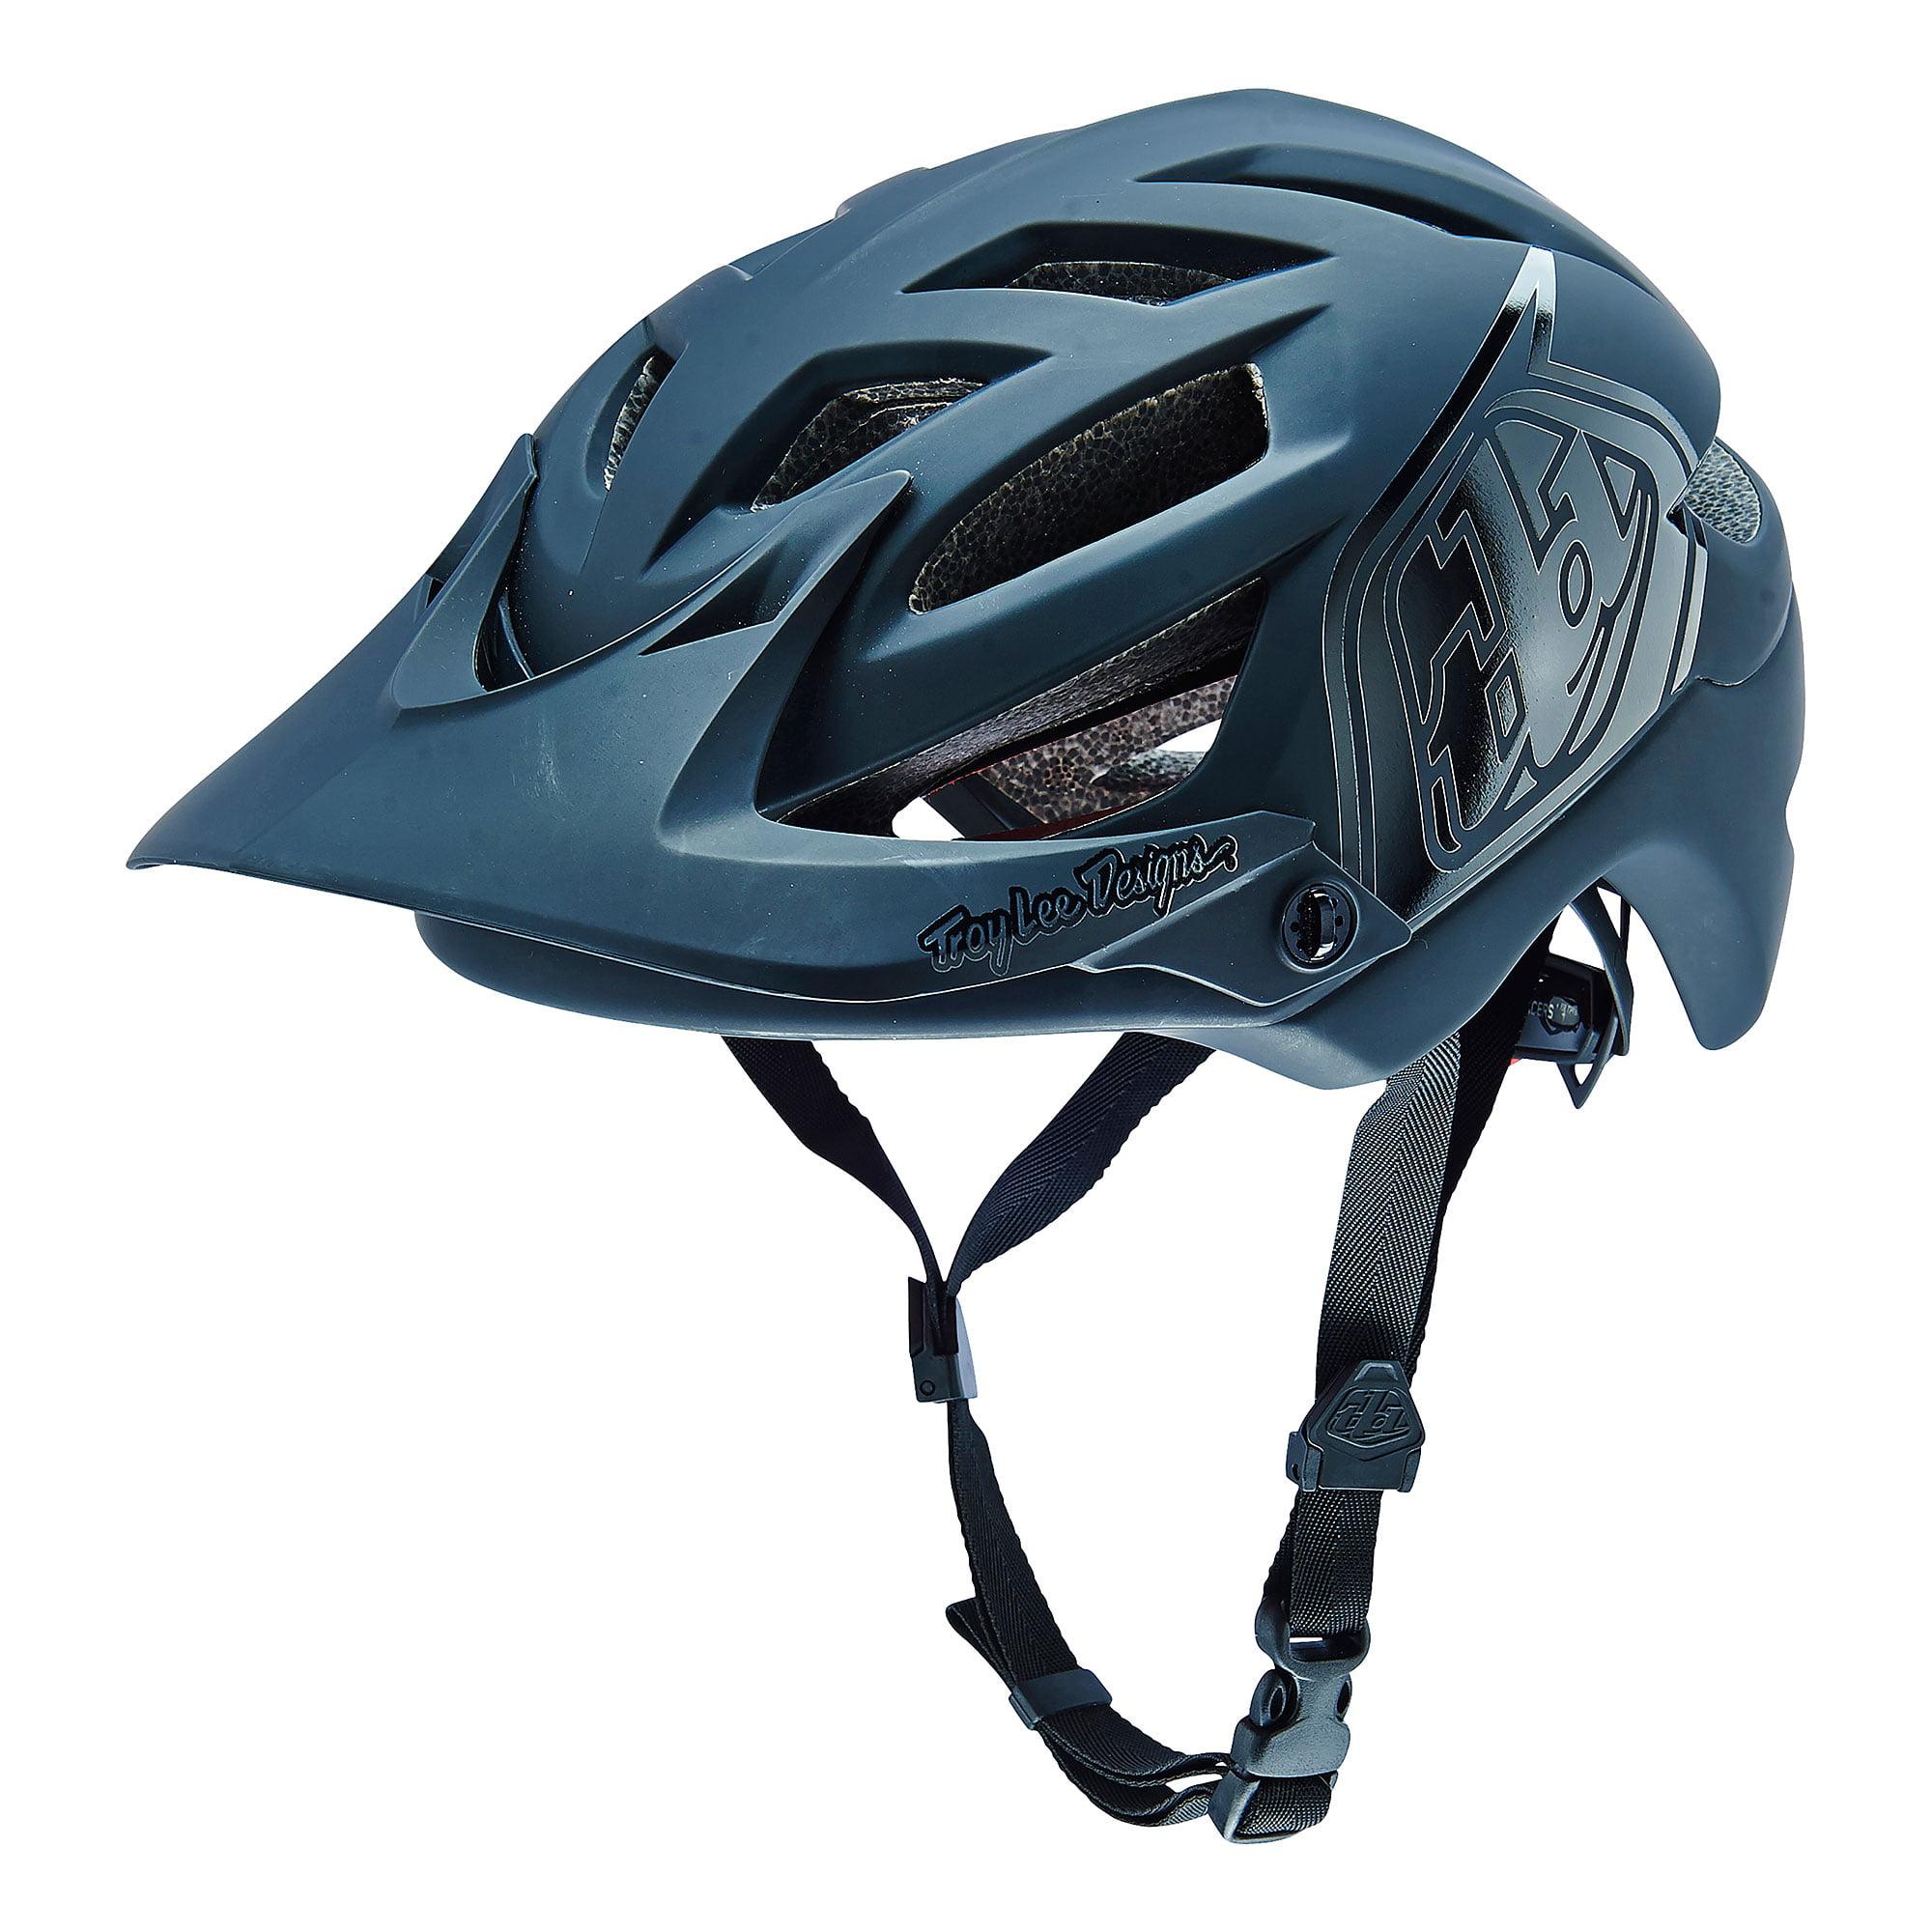 Troy Lee Designs Men's A1 Helmet Drone